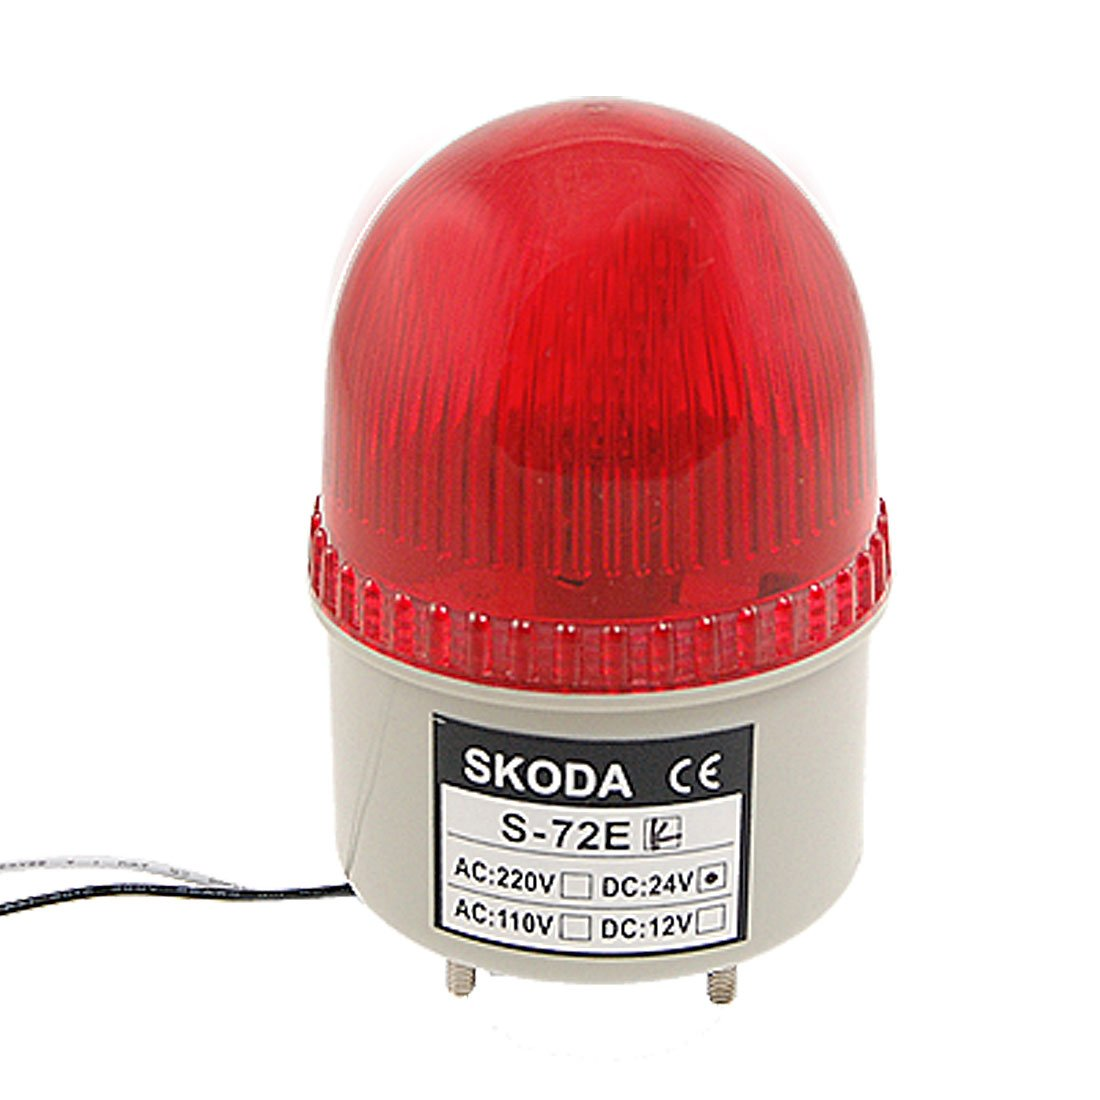 uxcell LED Warning Light Rotating Flashing Industrial Signal Alarm Lamp DC 24V Yellow LTE1101L